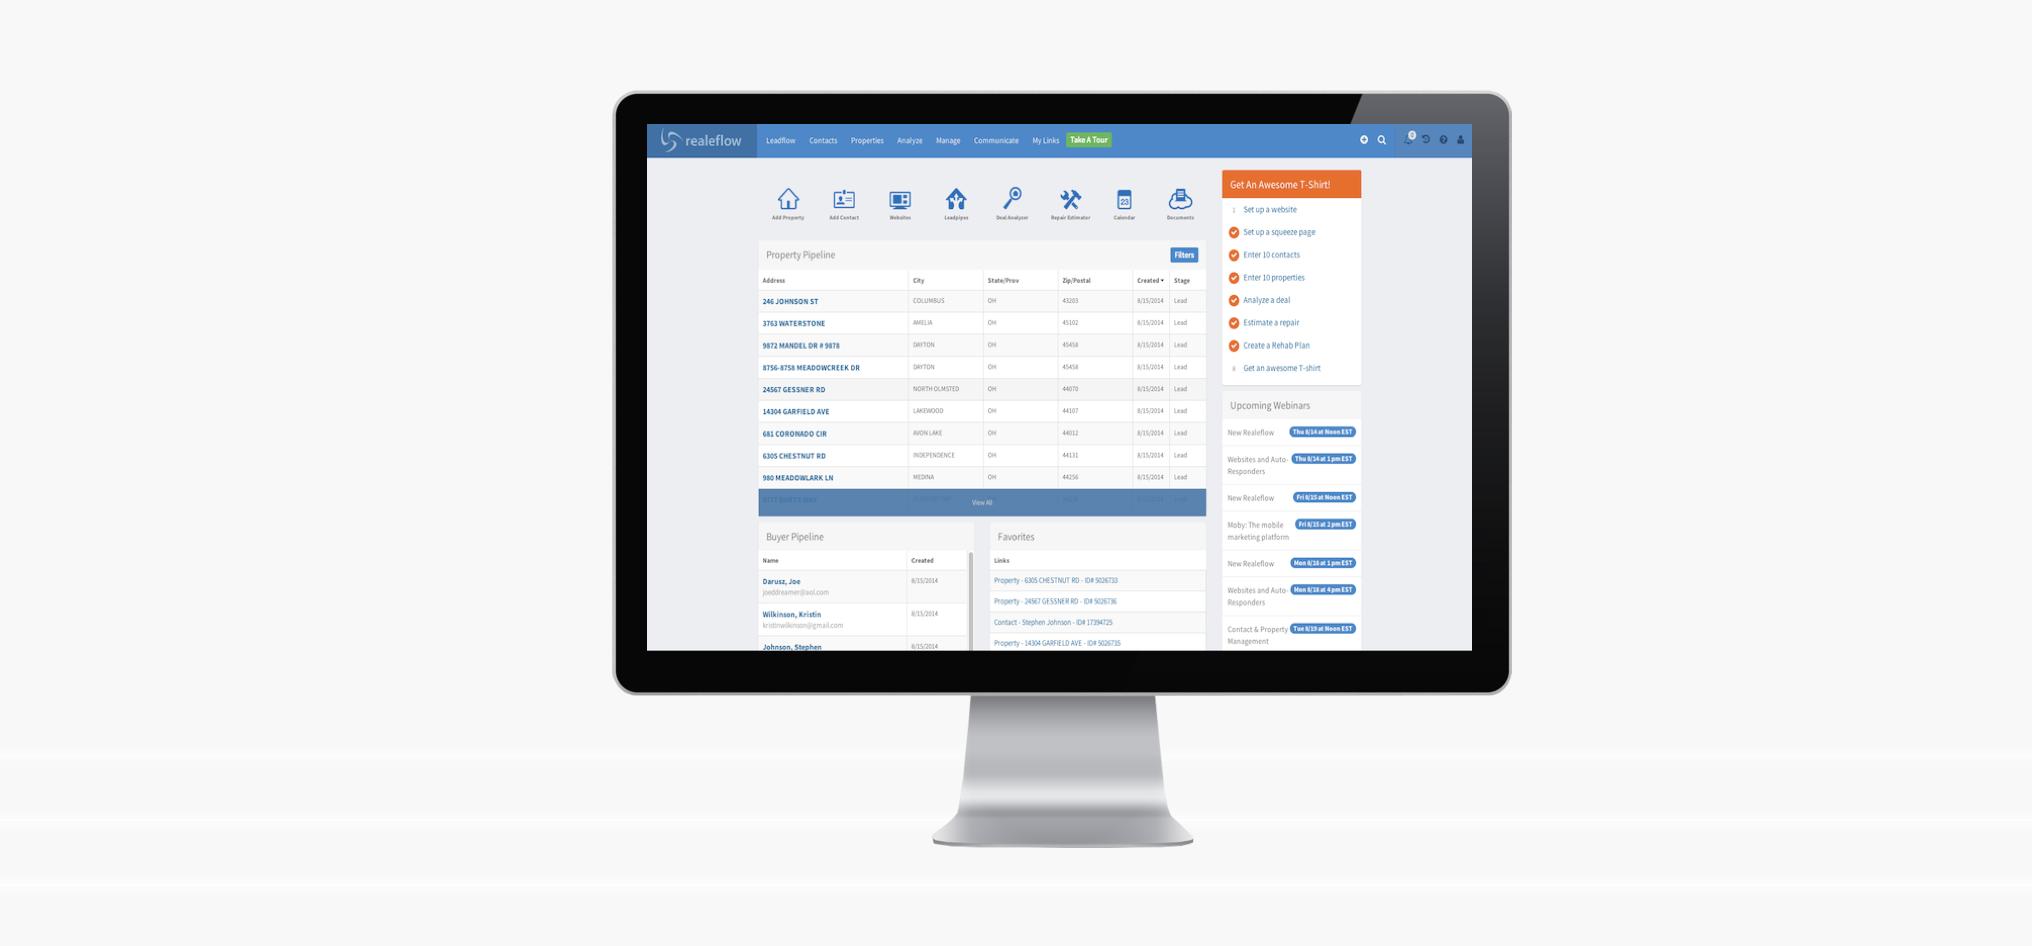 Realeflow integrates with PropertyRadar